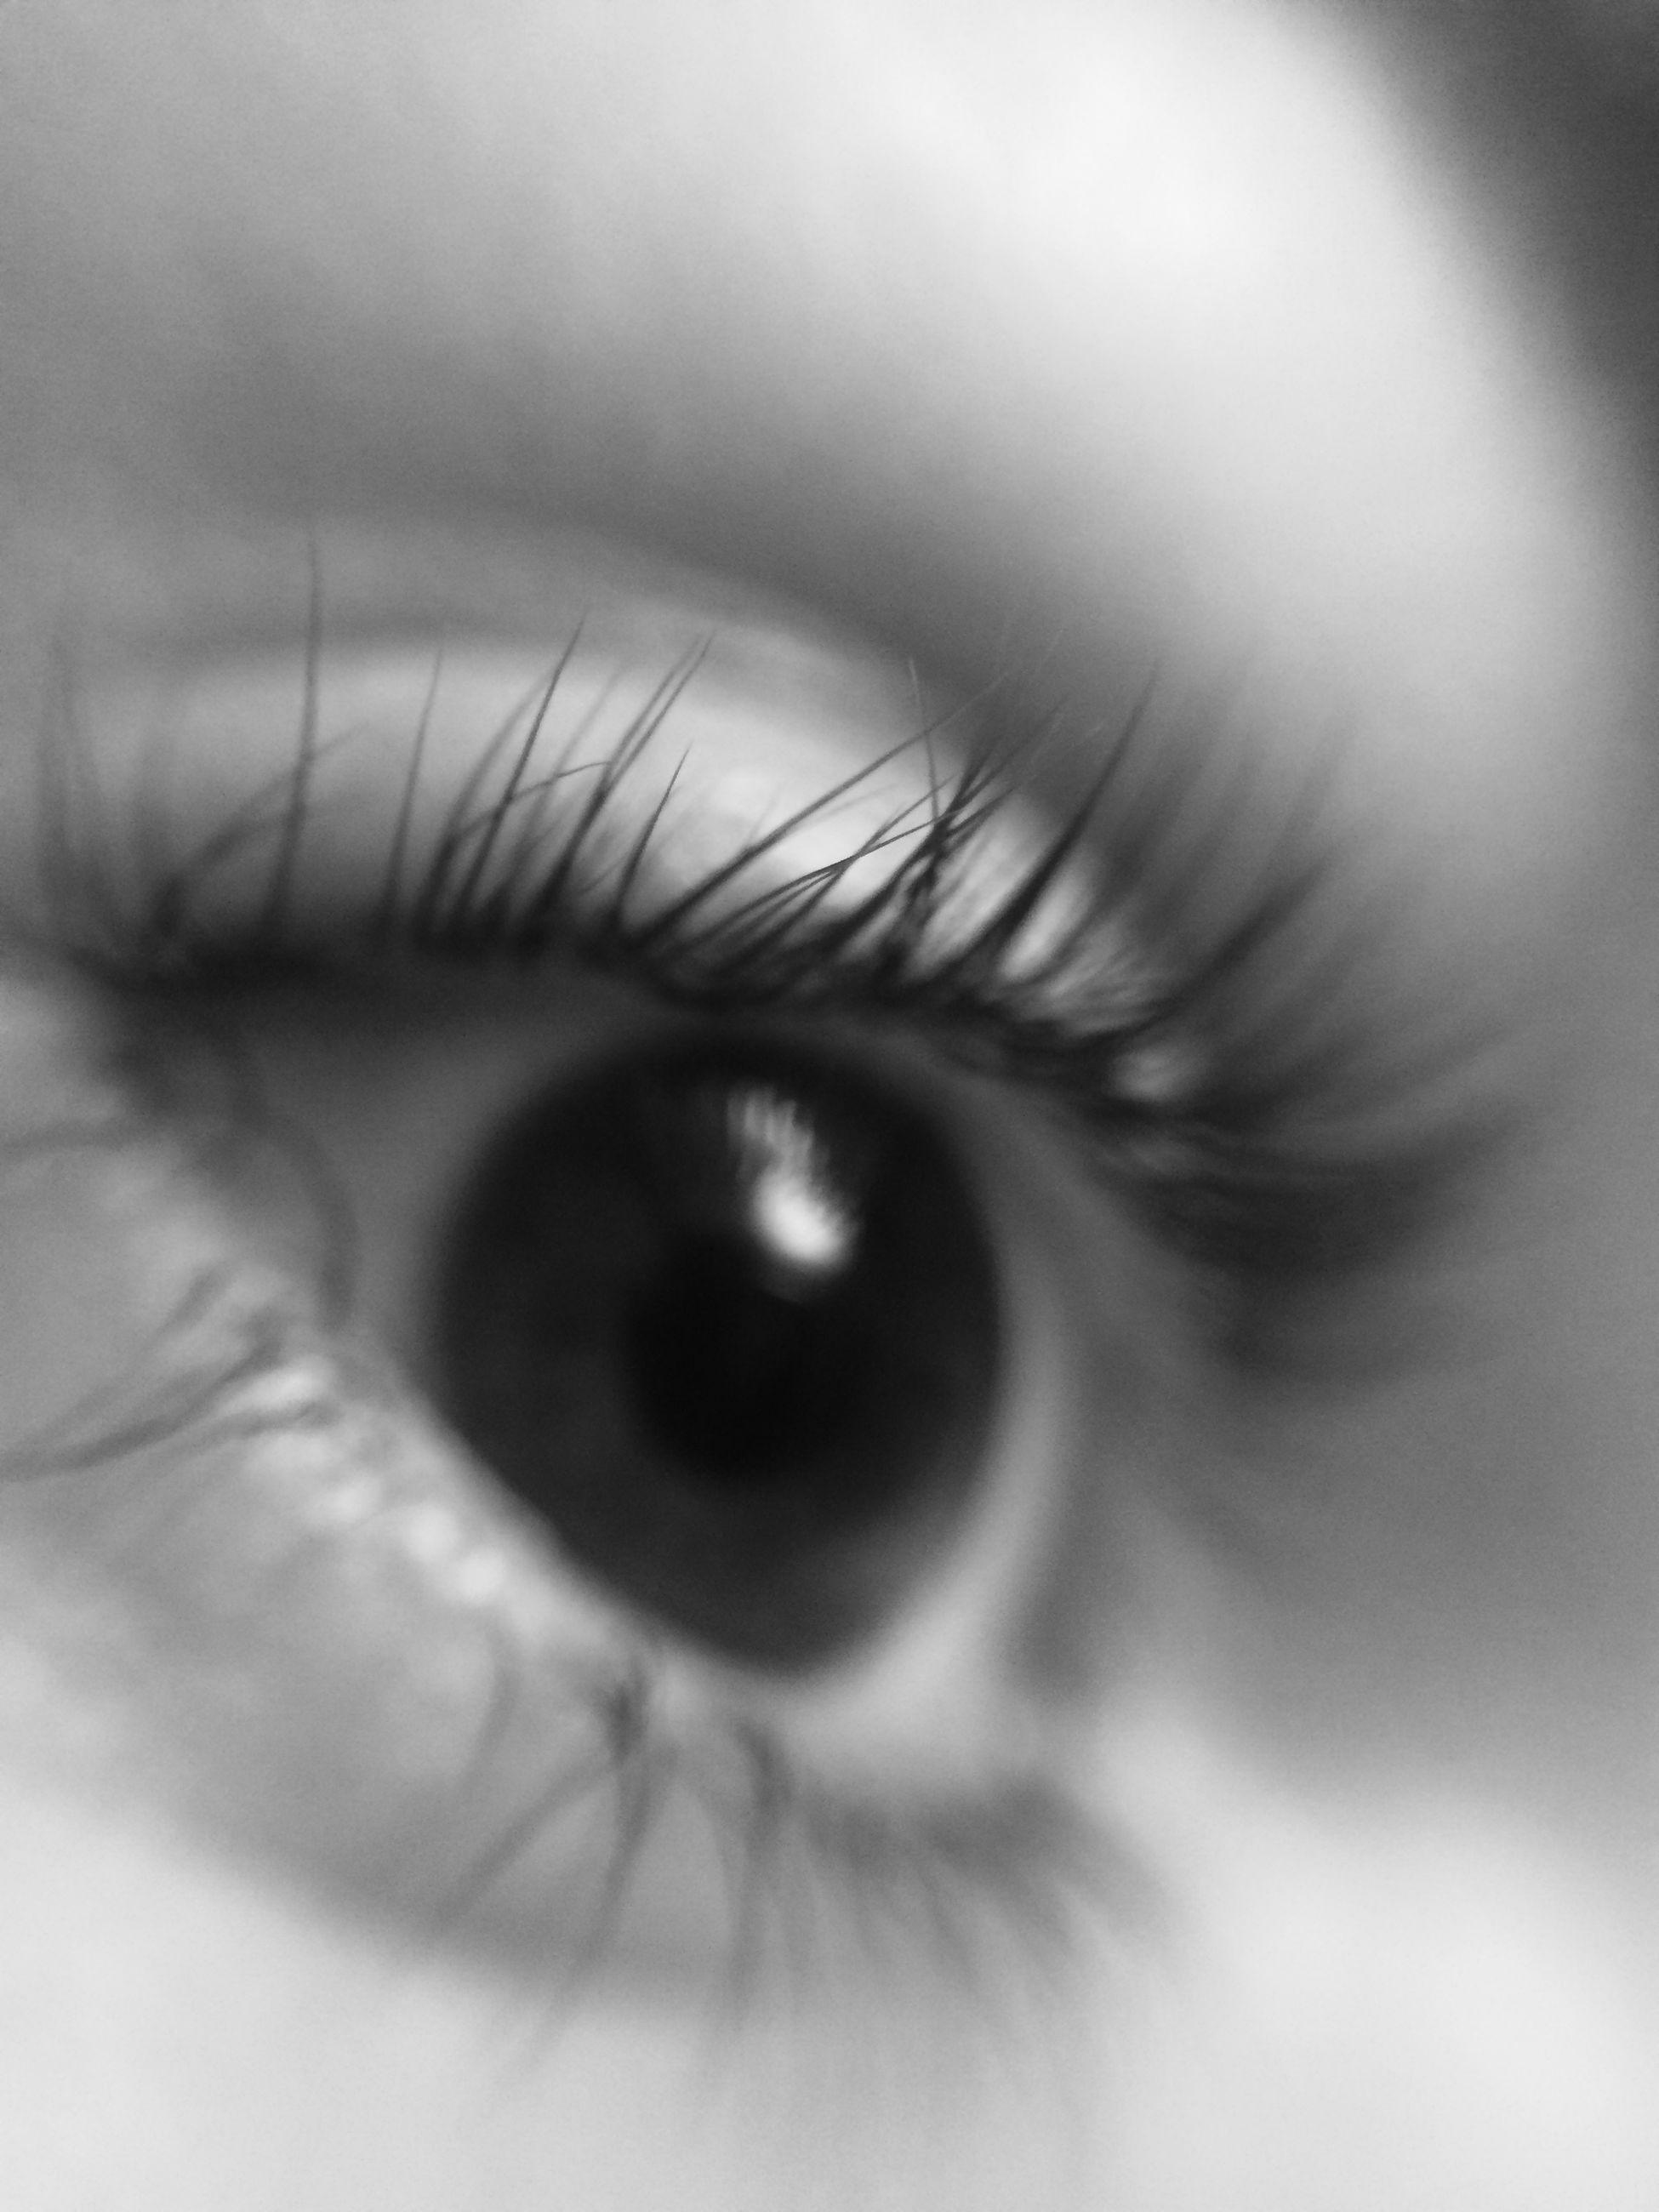 human eye, eyelash, part of, sensory perception, close-up, eyesight, human skin, unrecognizable person, extreme close-up, eyeball, cropped, person, iris - eye, extreme close up, lifestyles, vision